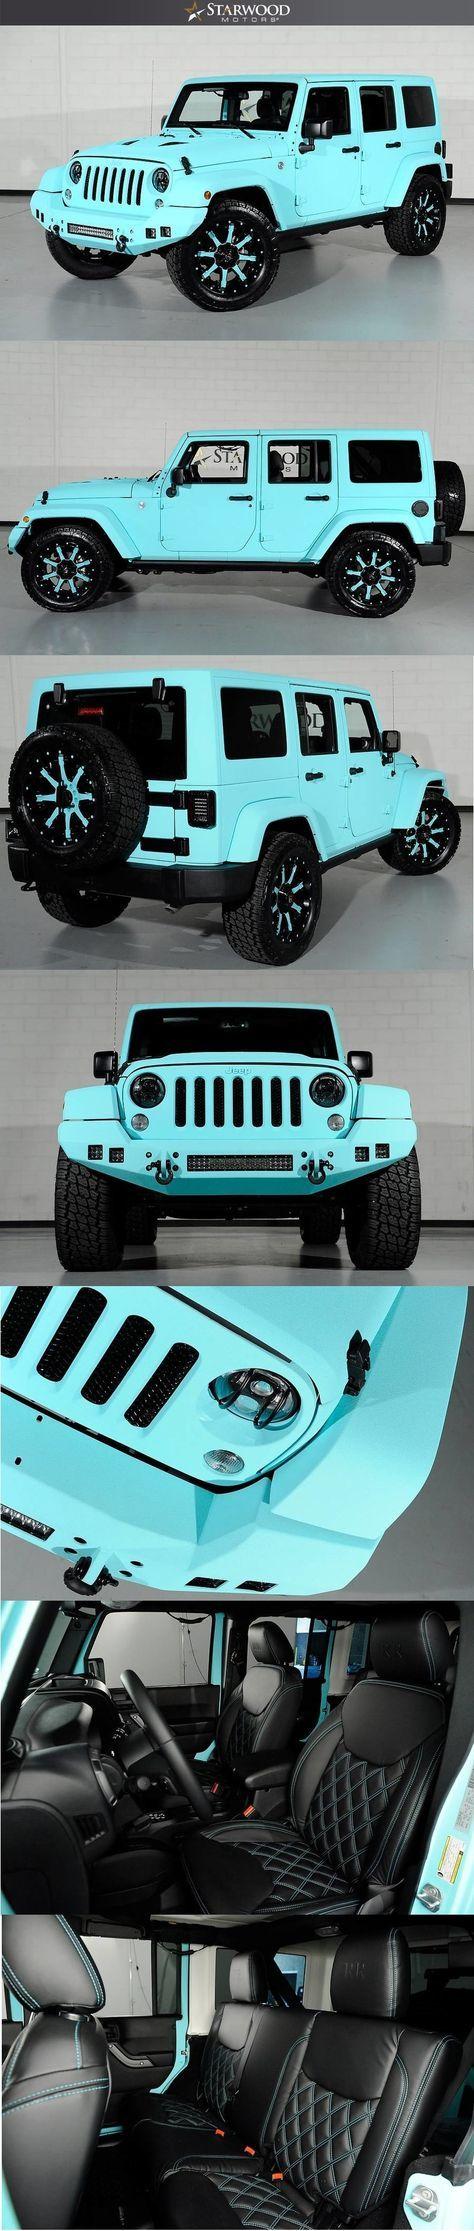 Starwood motors custom tiffany blue jeep wrangler im in for Motores y vehiculos nj